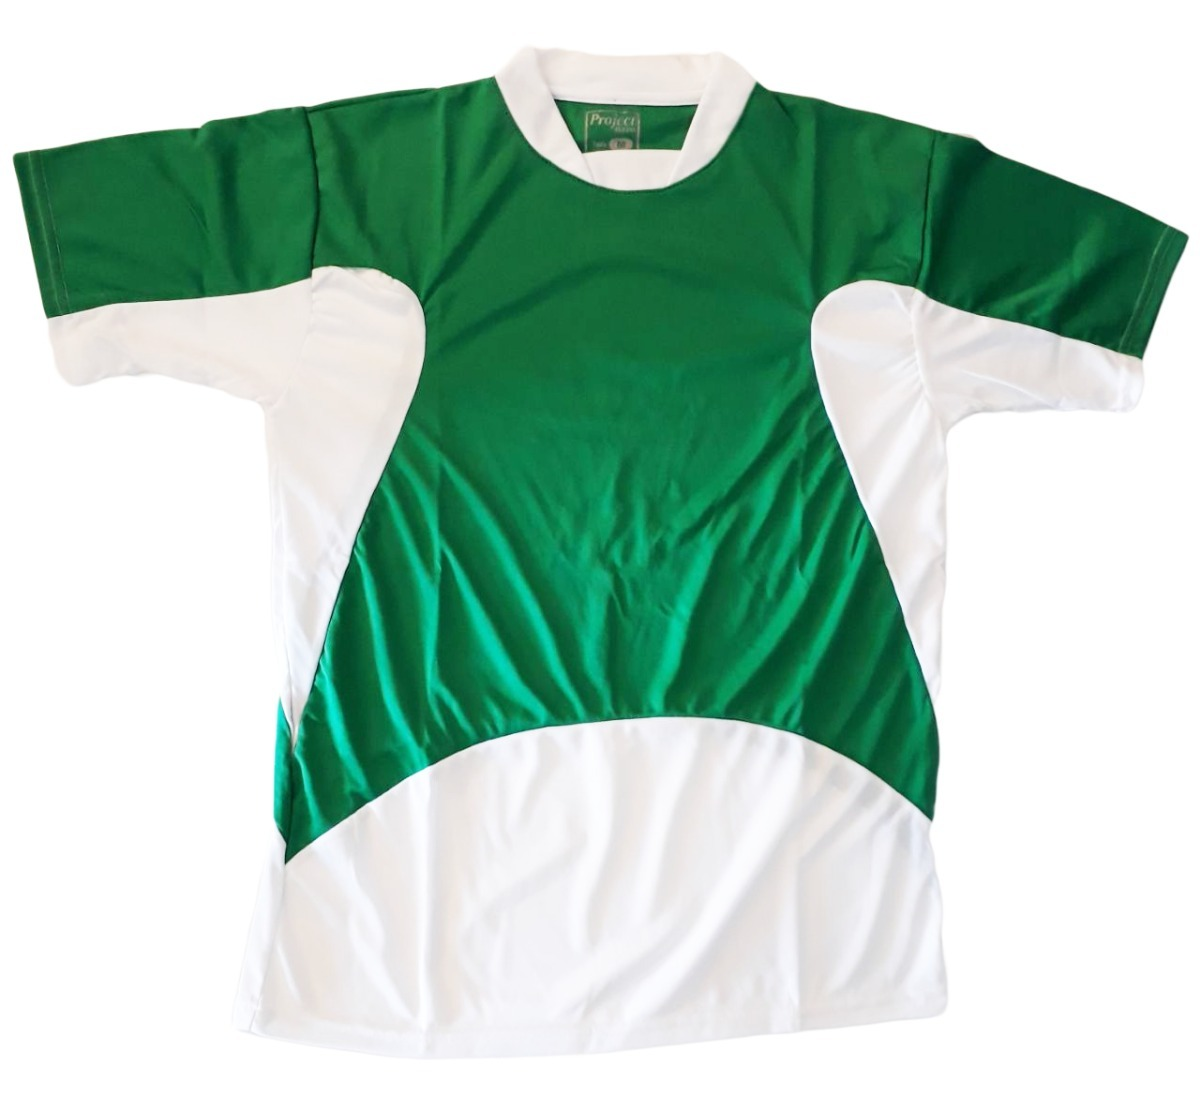 b8736c9e98e1c Camisetas para niños buzo de arquero fútbol cargando zoom jpg 1200x1102  Camisetas de futbol para ninos